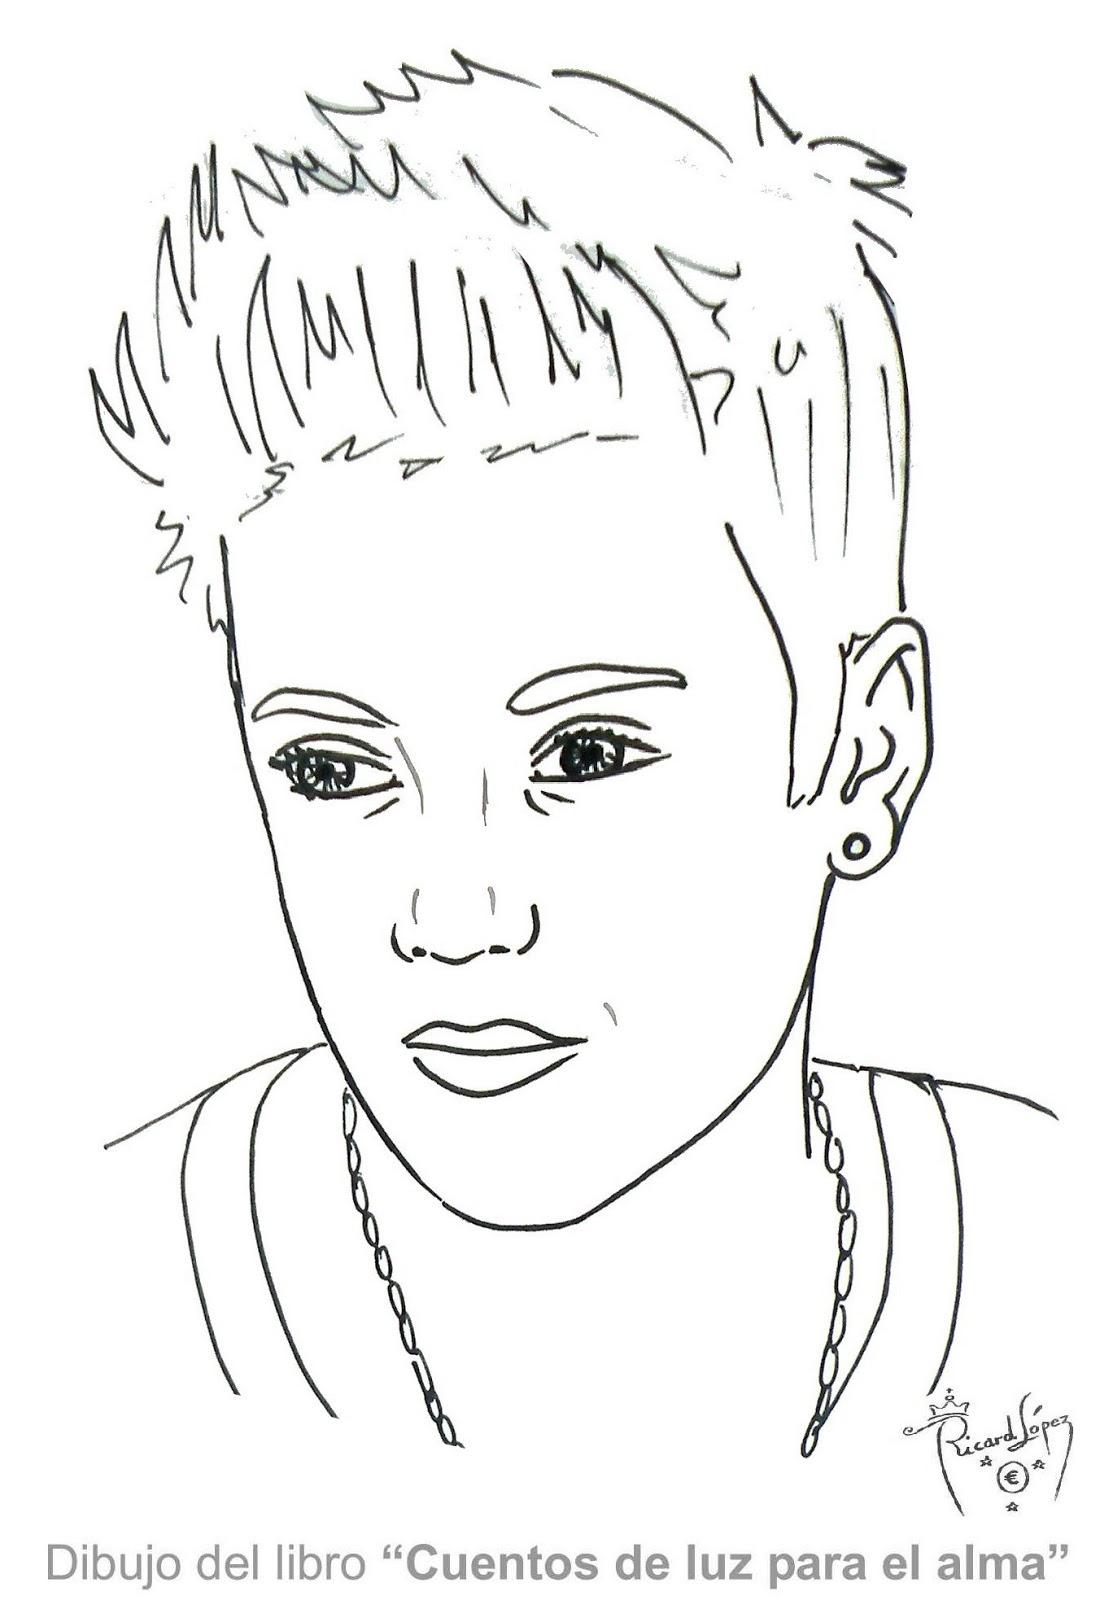 Dibujos Originales Para Pintar. Perfect Dibujo De Justin Bieber With ...